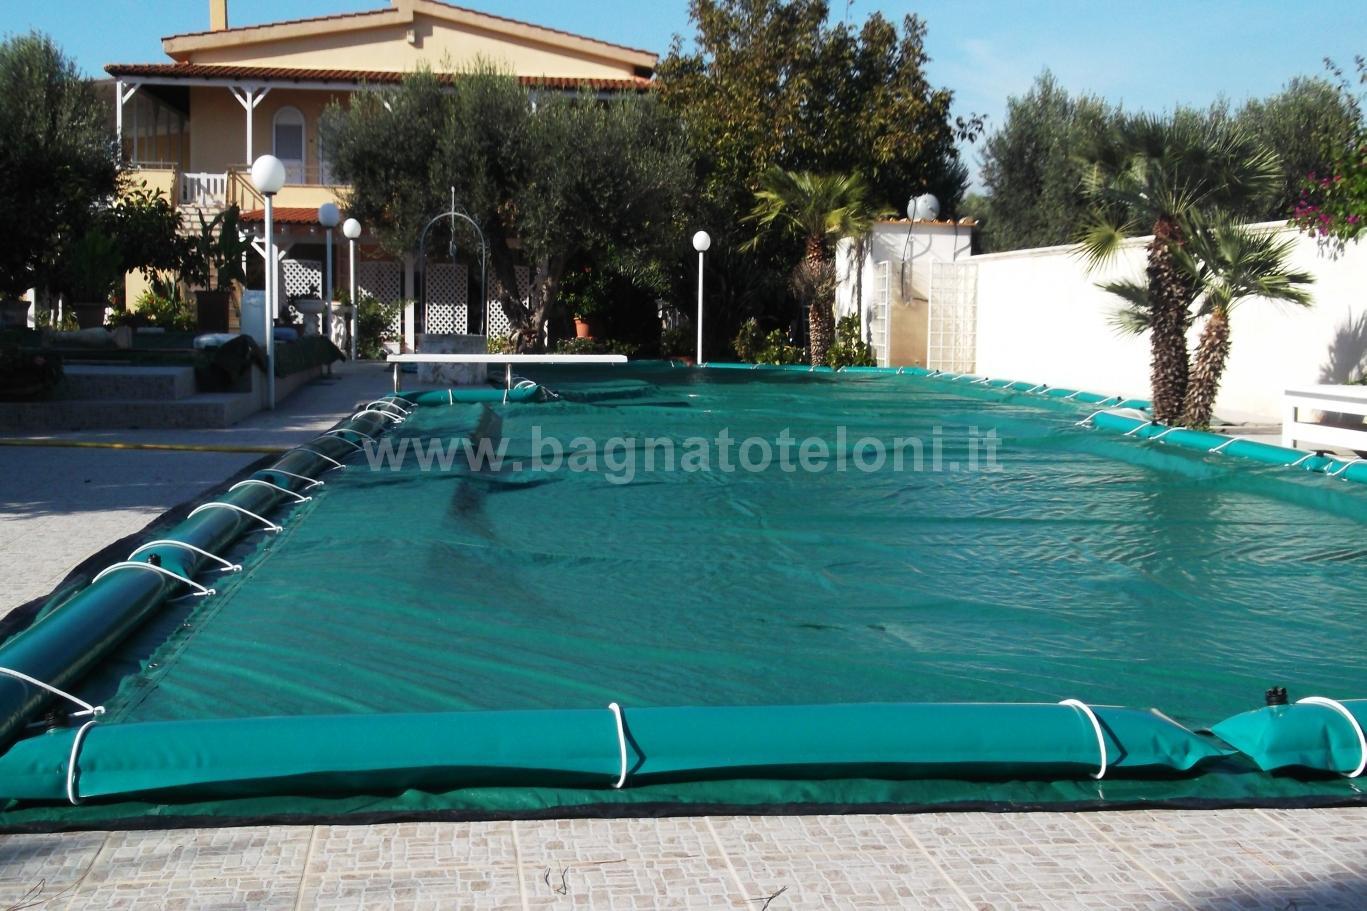 coperture in pvc per piscine